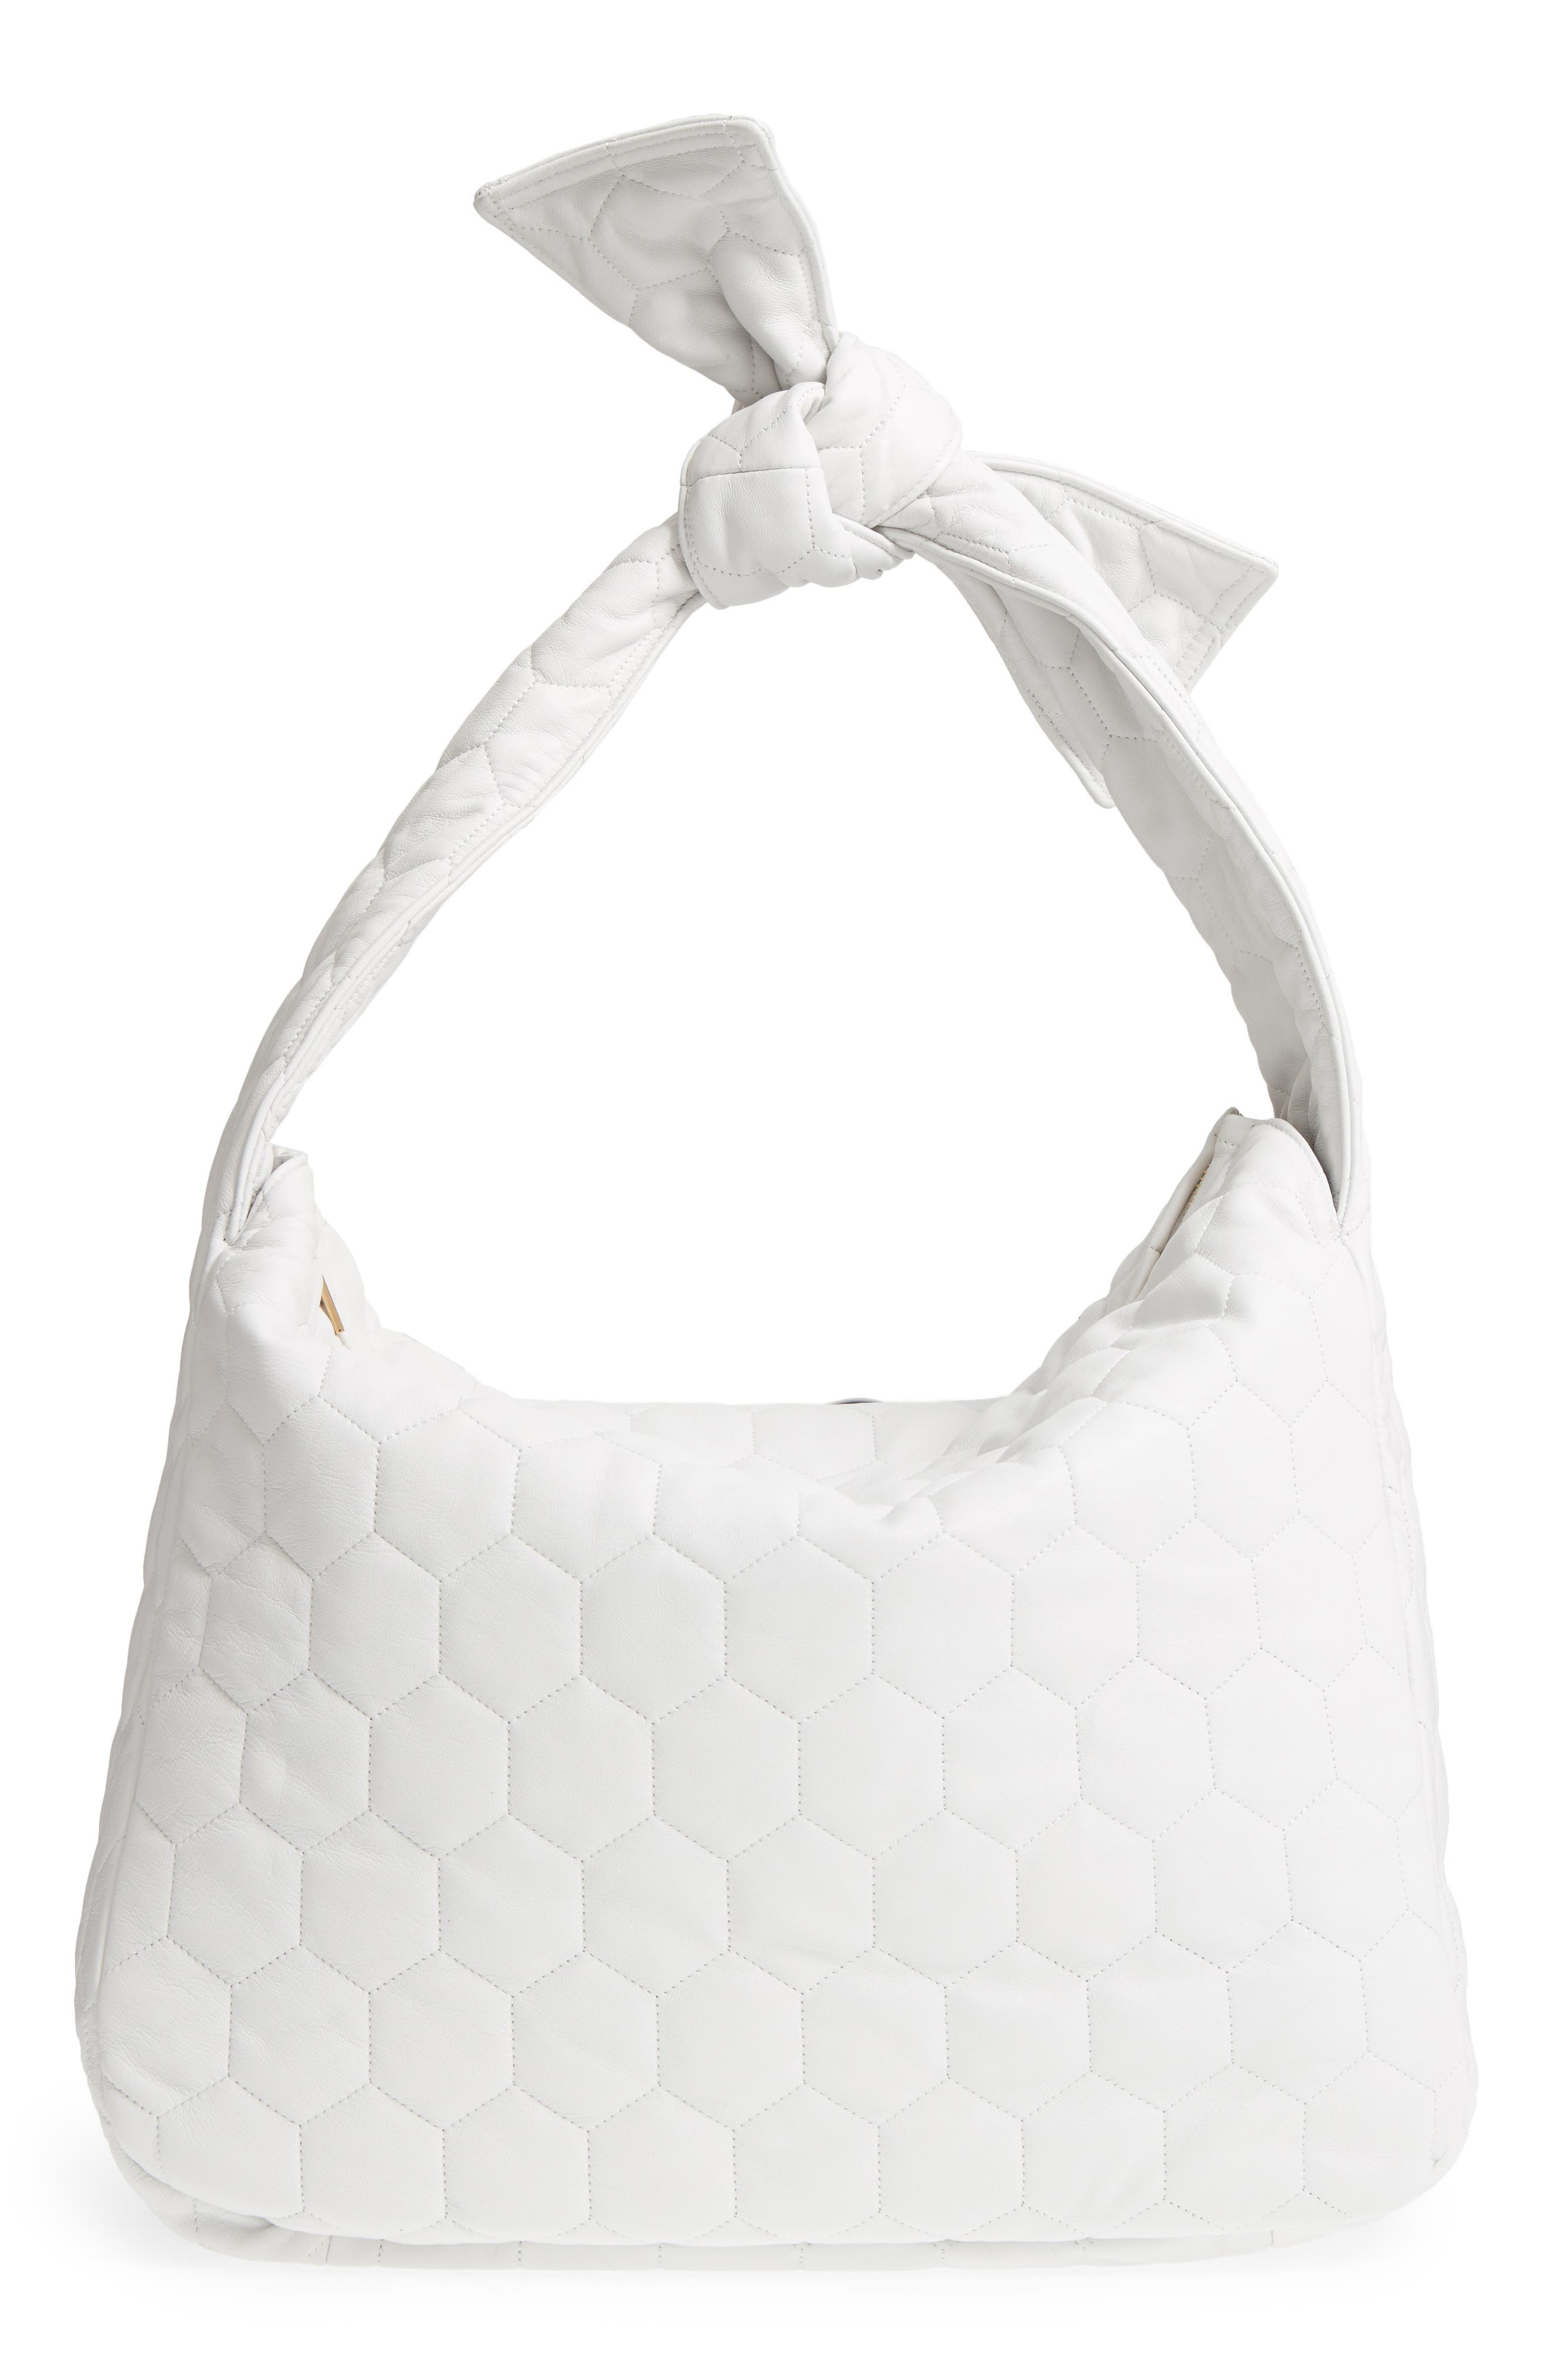 Balloon Leather Shoulder Bag,                             Main thumbnail 1, color,                             White